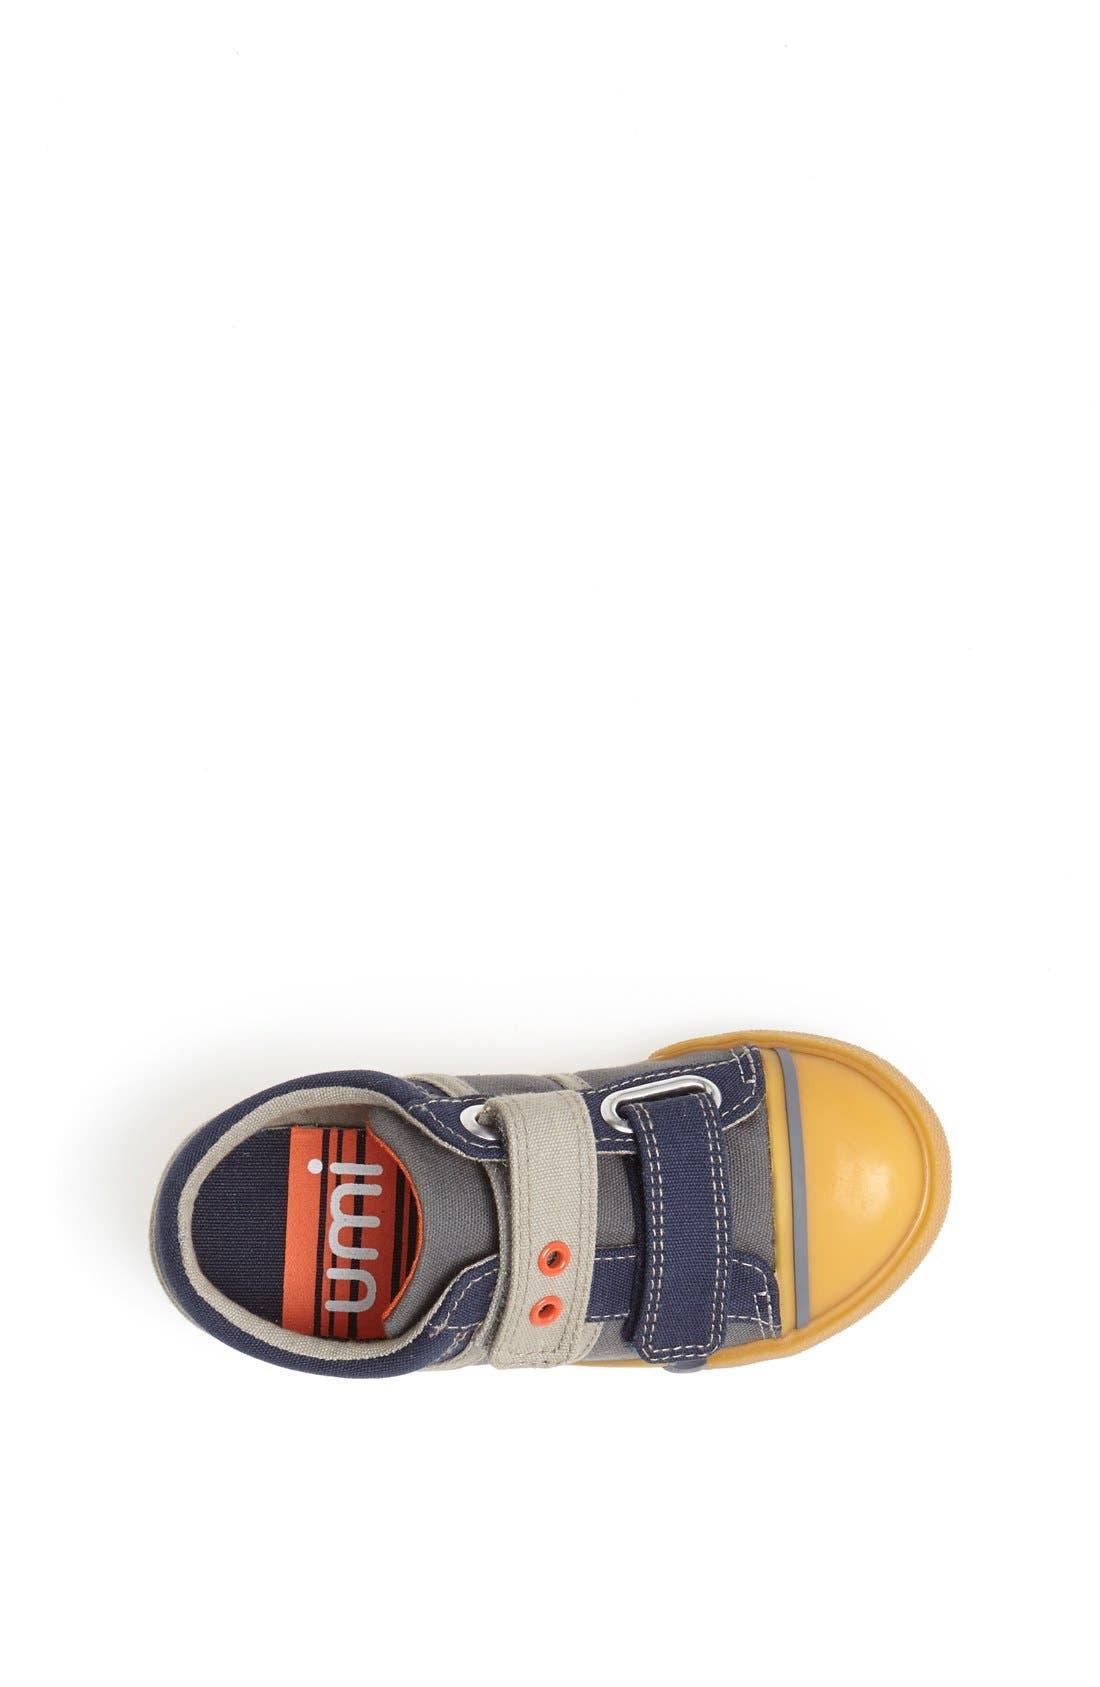 Alternate Image 3  - Umi 'Mack' Sneaker (Toddler, Little Kid & Big Kid)